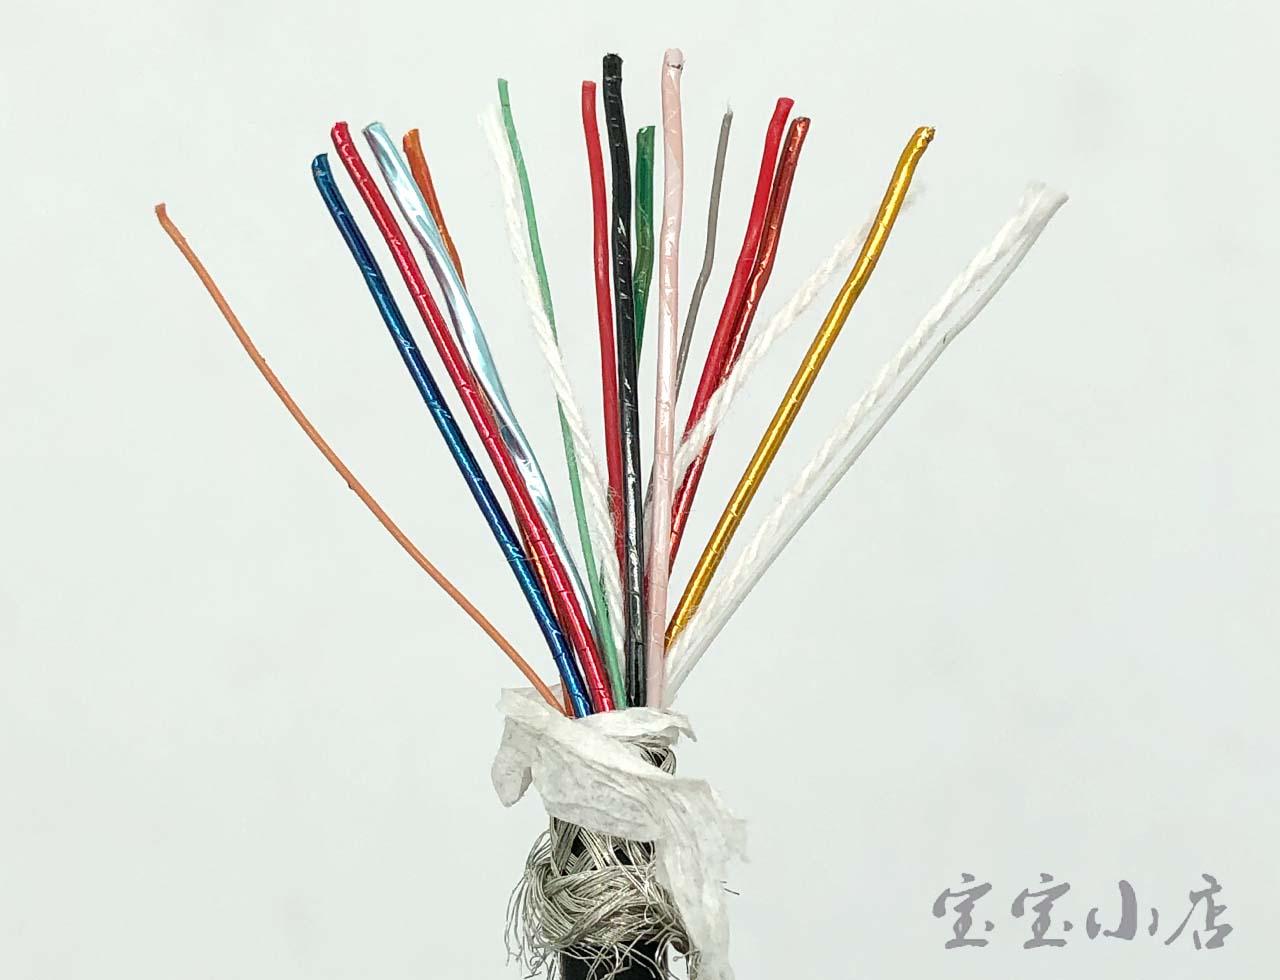 惠普HP Thunderbolt™3 100W供电5A 0.7m cable 雷电3 霹雳3 40Gbps数据线Power Cable External 4.5mm/USB-C to 4.5mm/AC+USB Type-C 843010-001